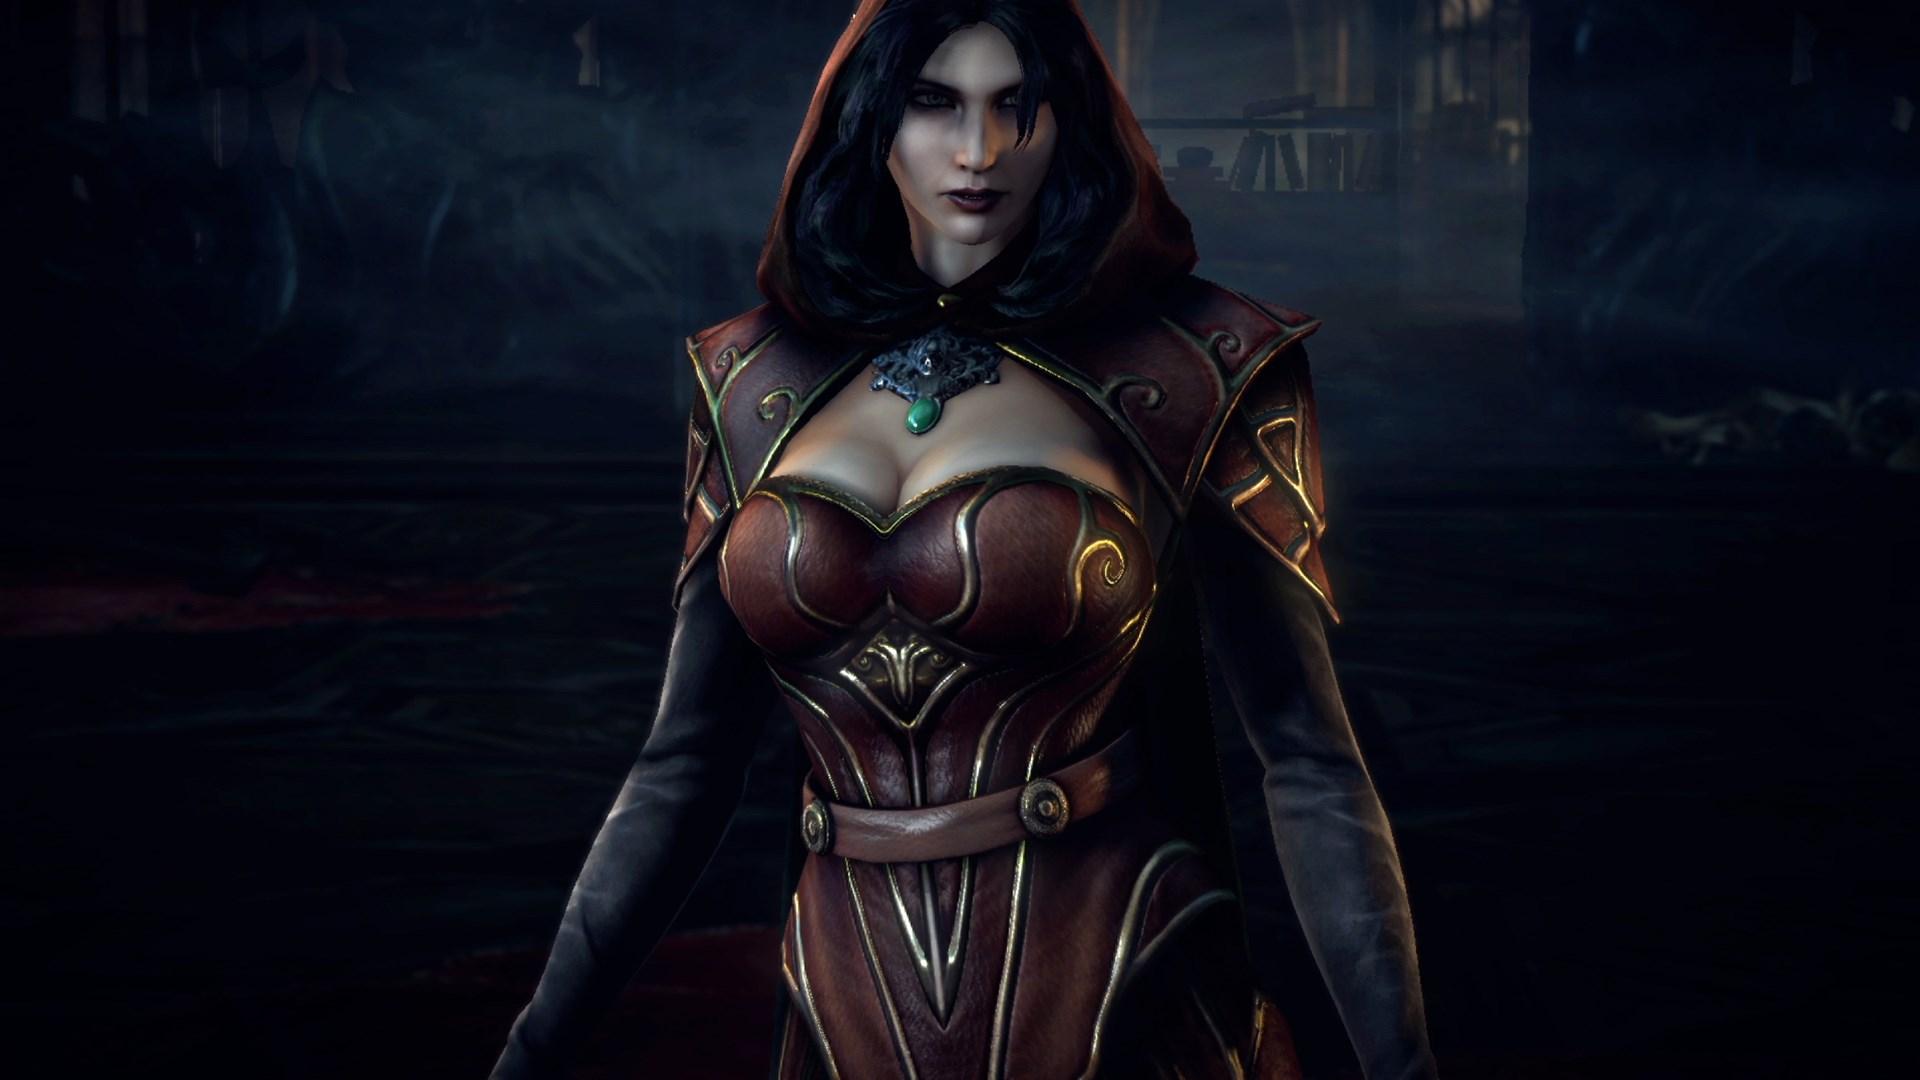 Screenshoty z Castlevania: Lords of Shadow 2 83315